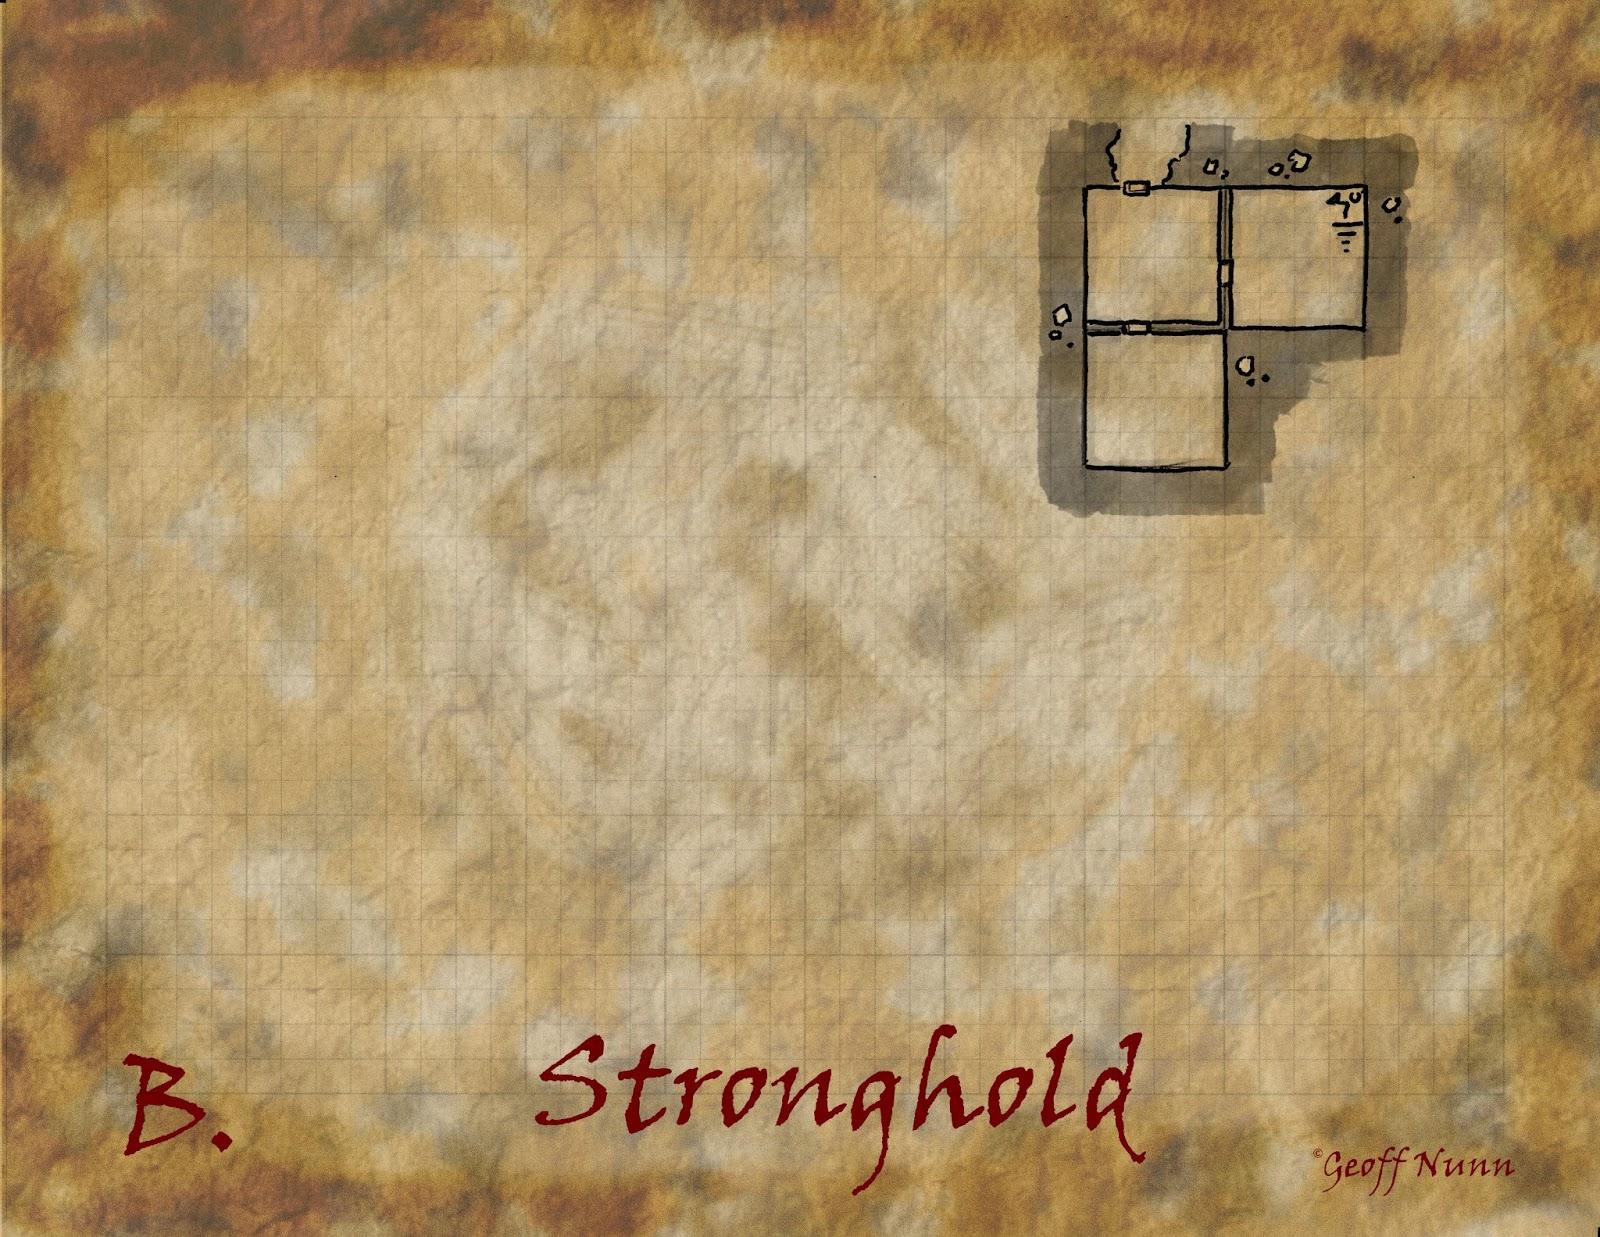 StrongholdB